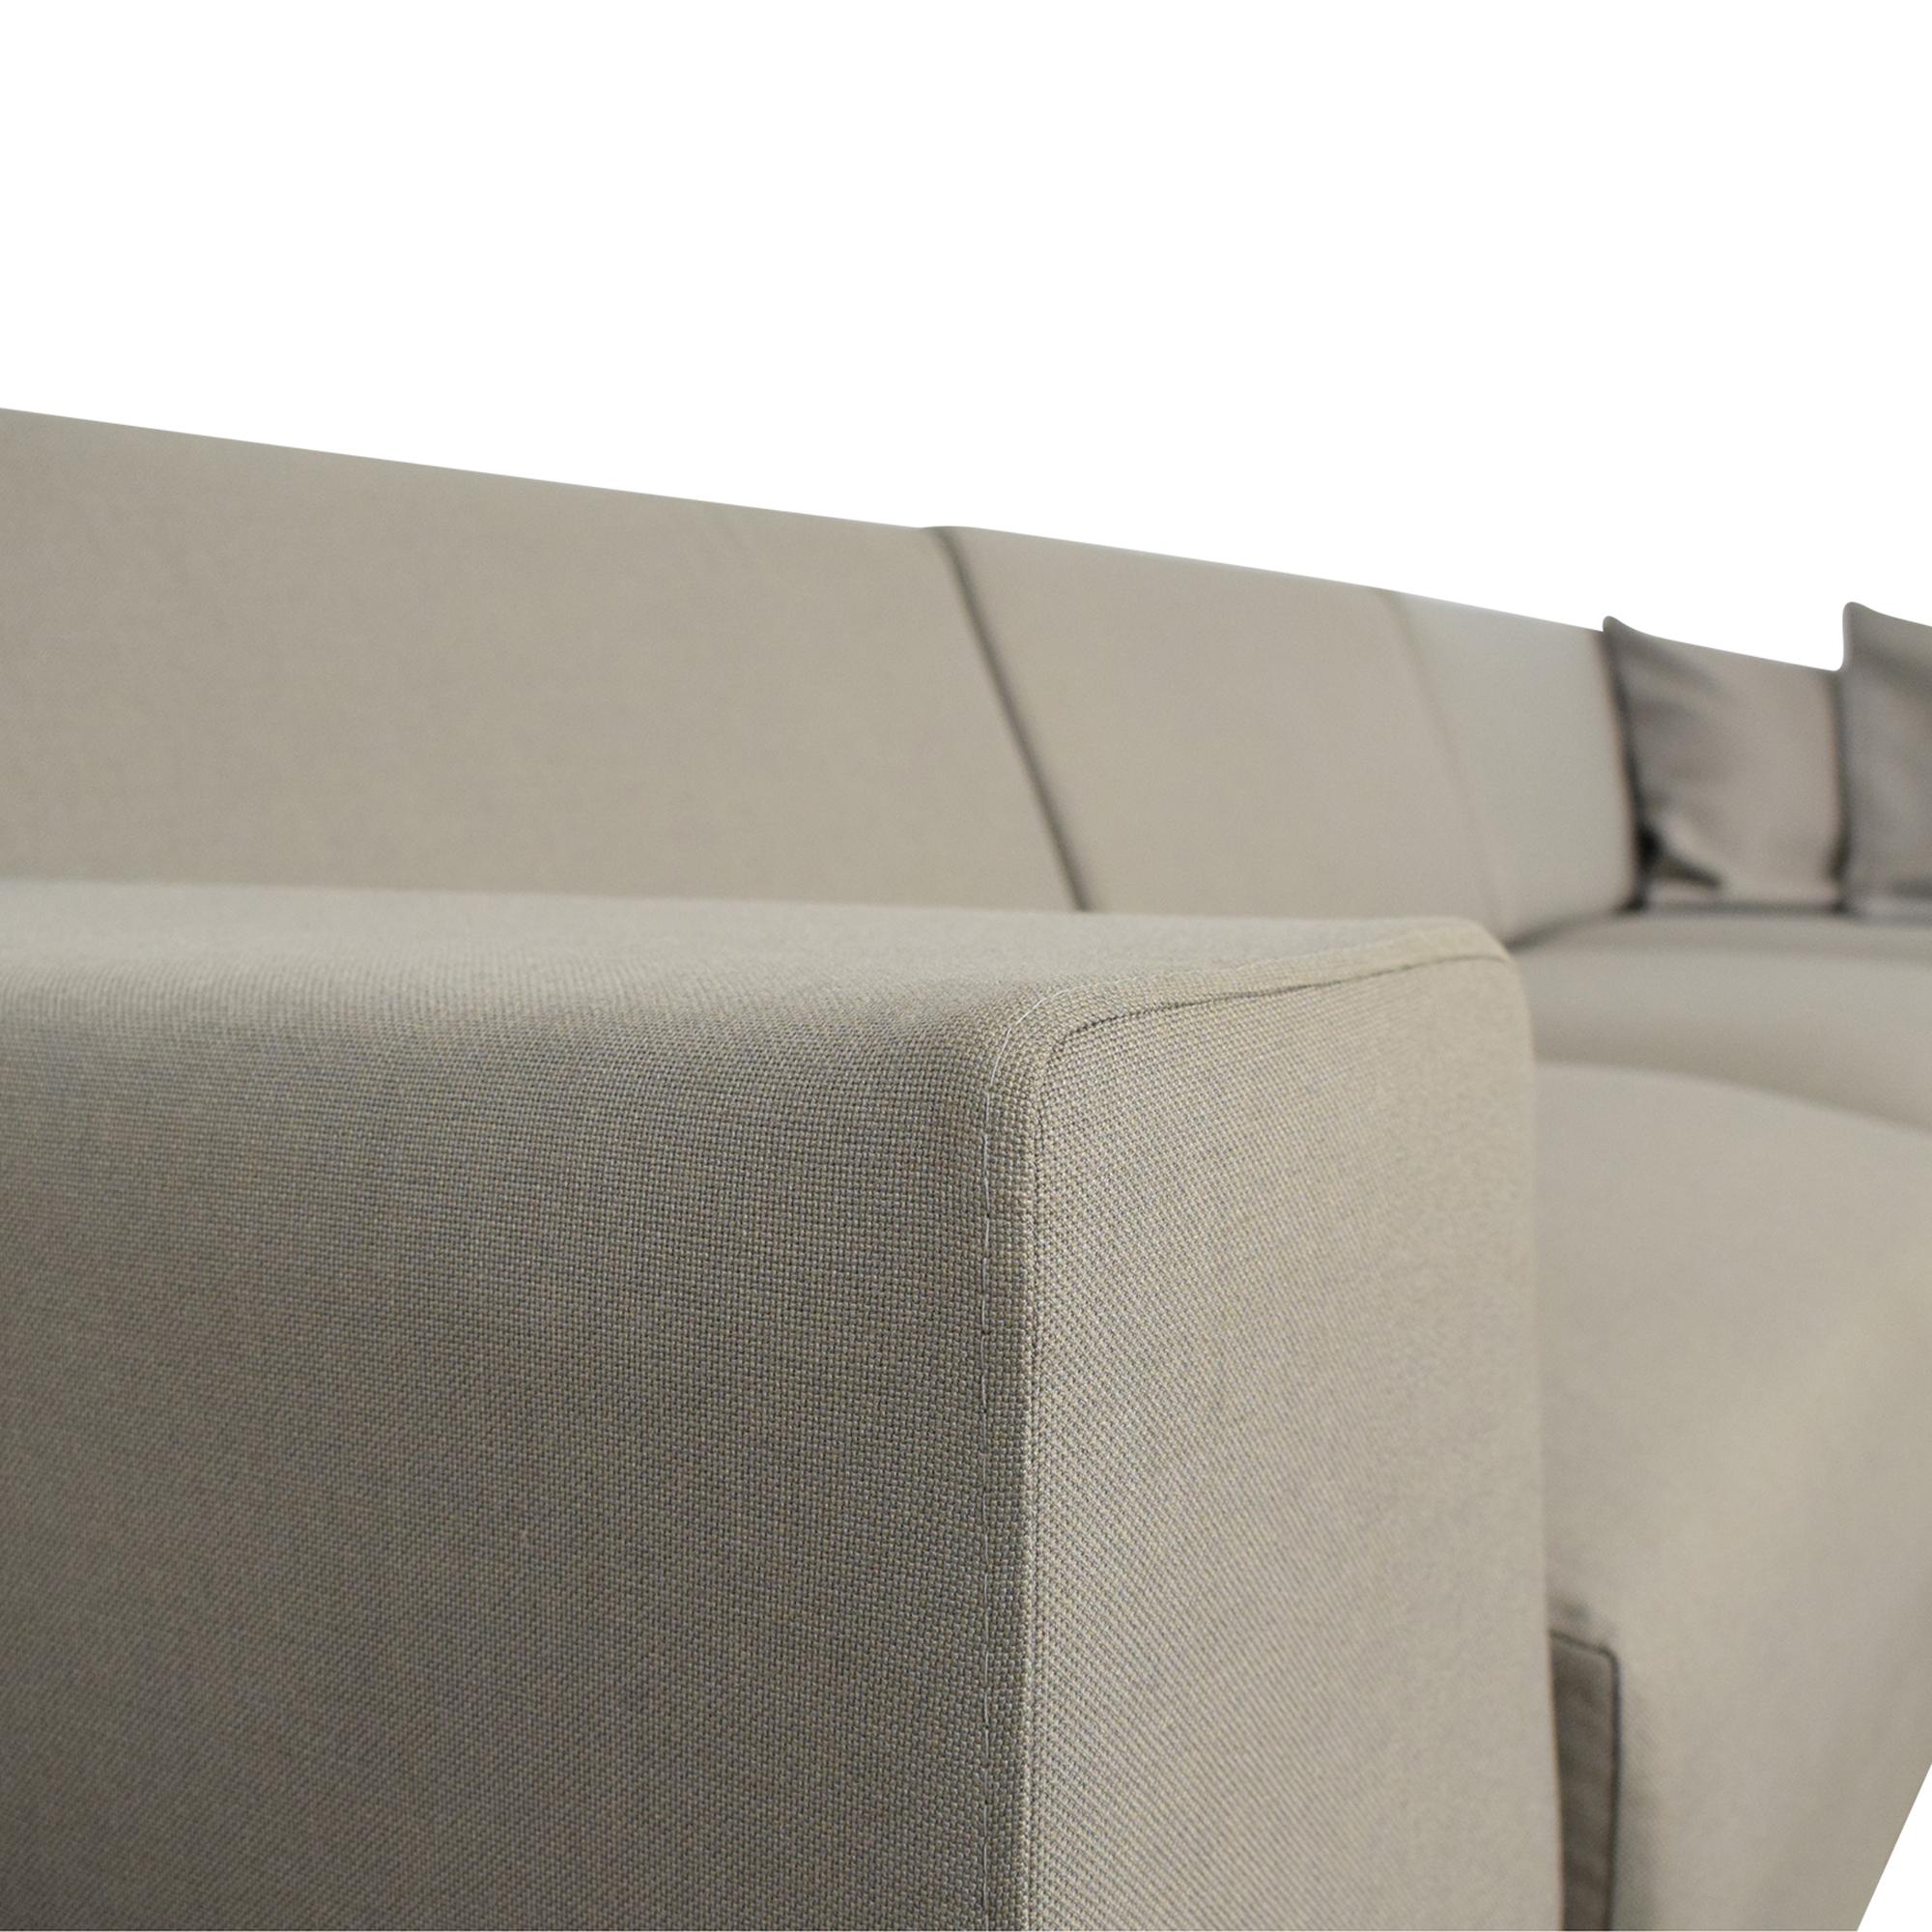 Lazzoni Lazzoni Bikom Modular Sectional Sofa ct